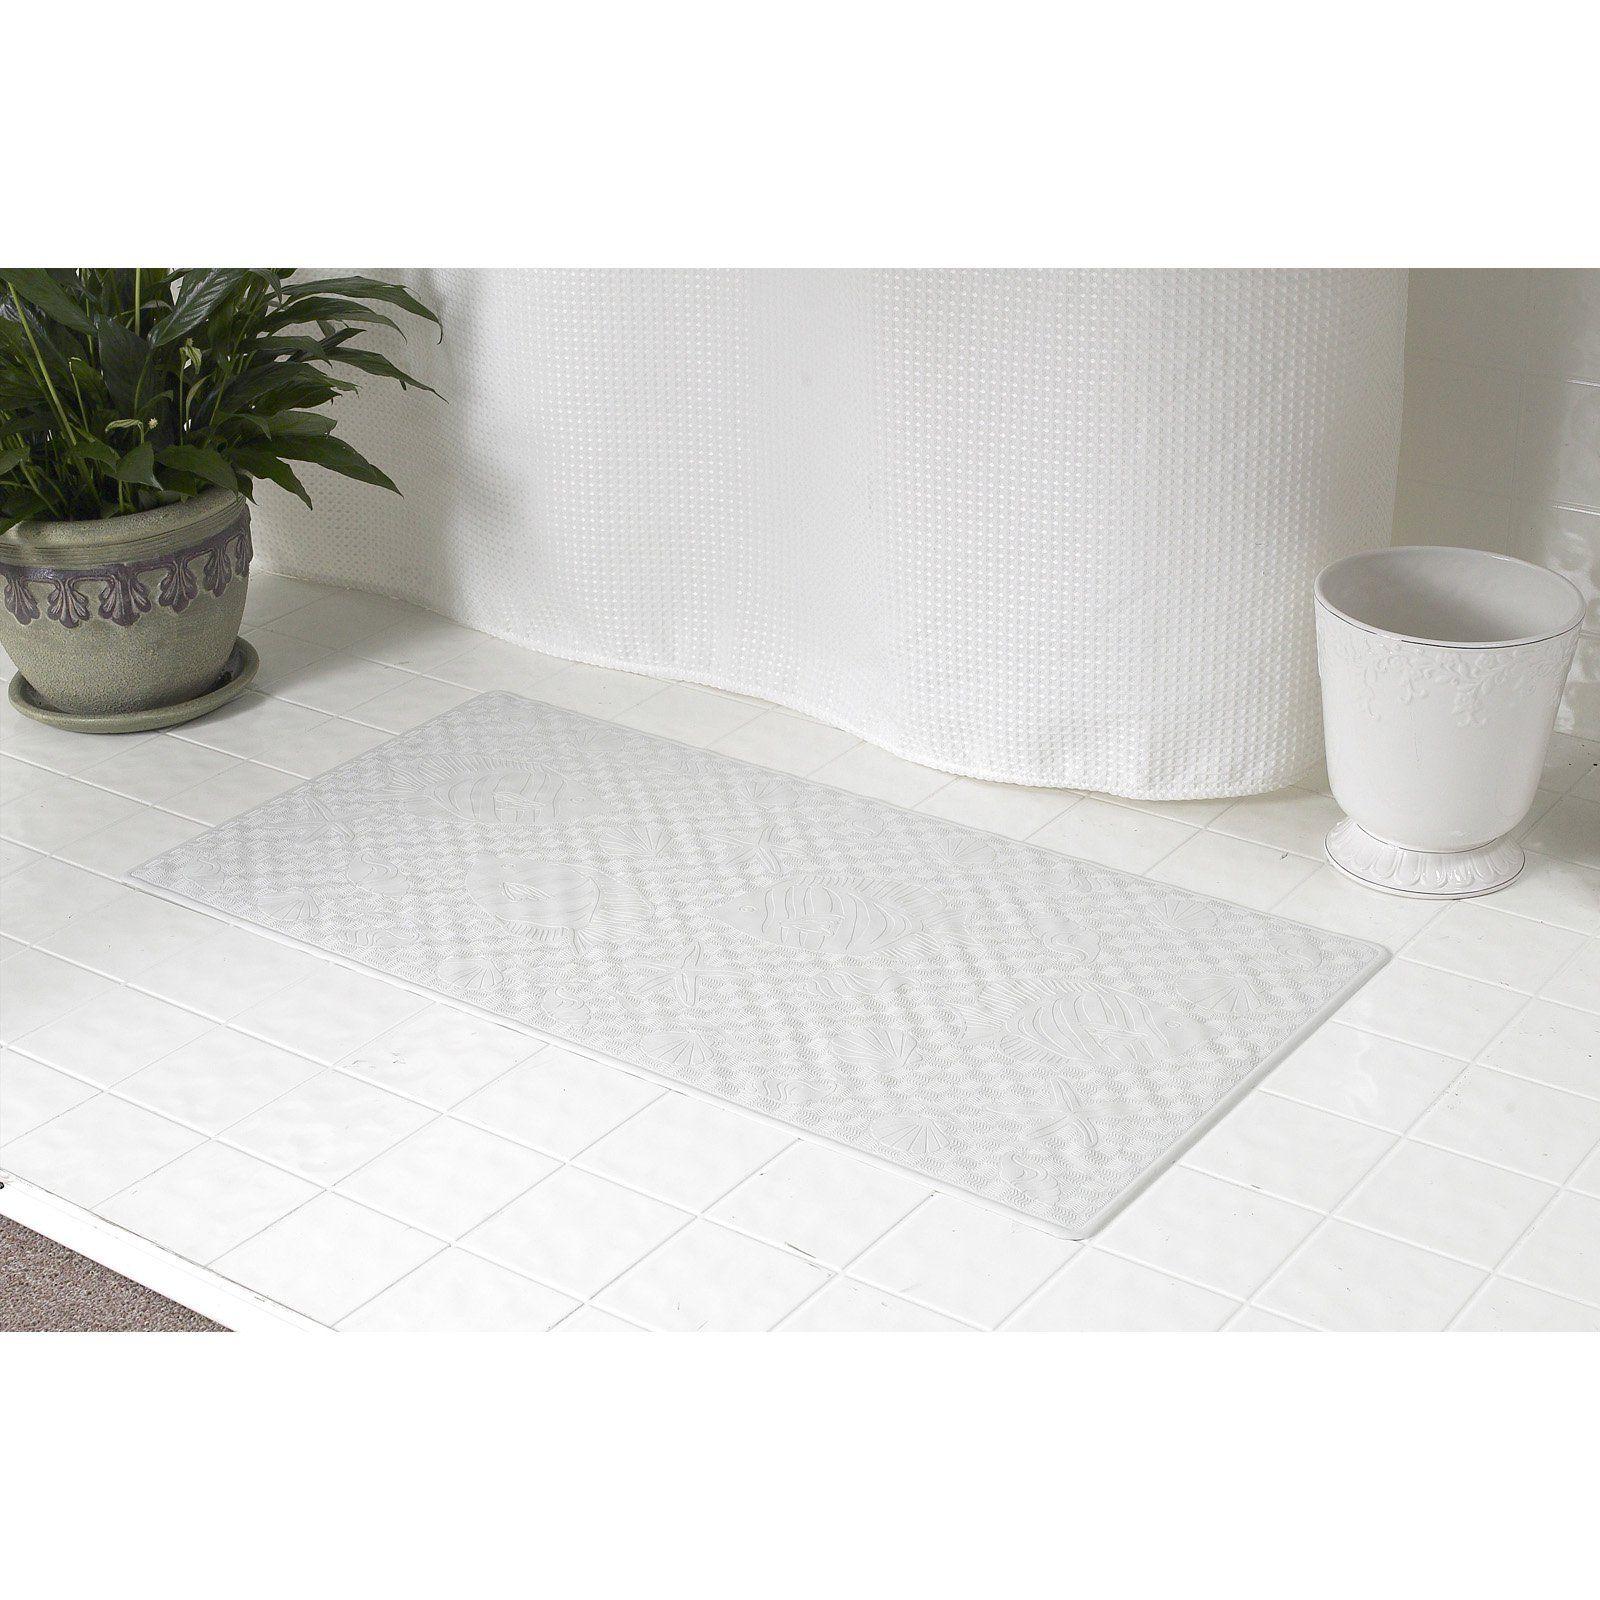 Carnation Home Fashions Rubber Shower Mat Bathtub Mat Tub Mat